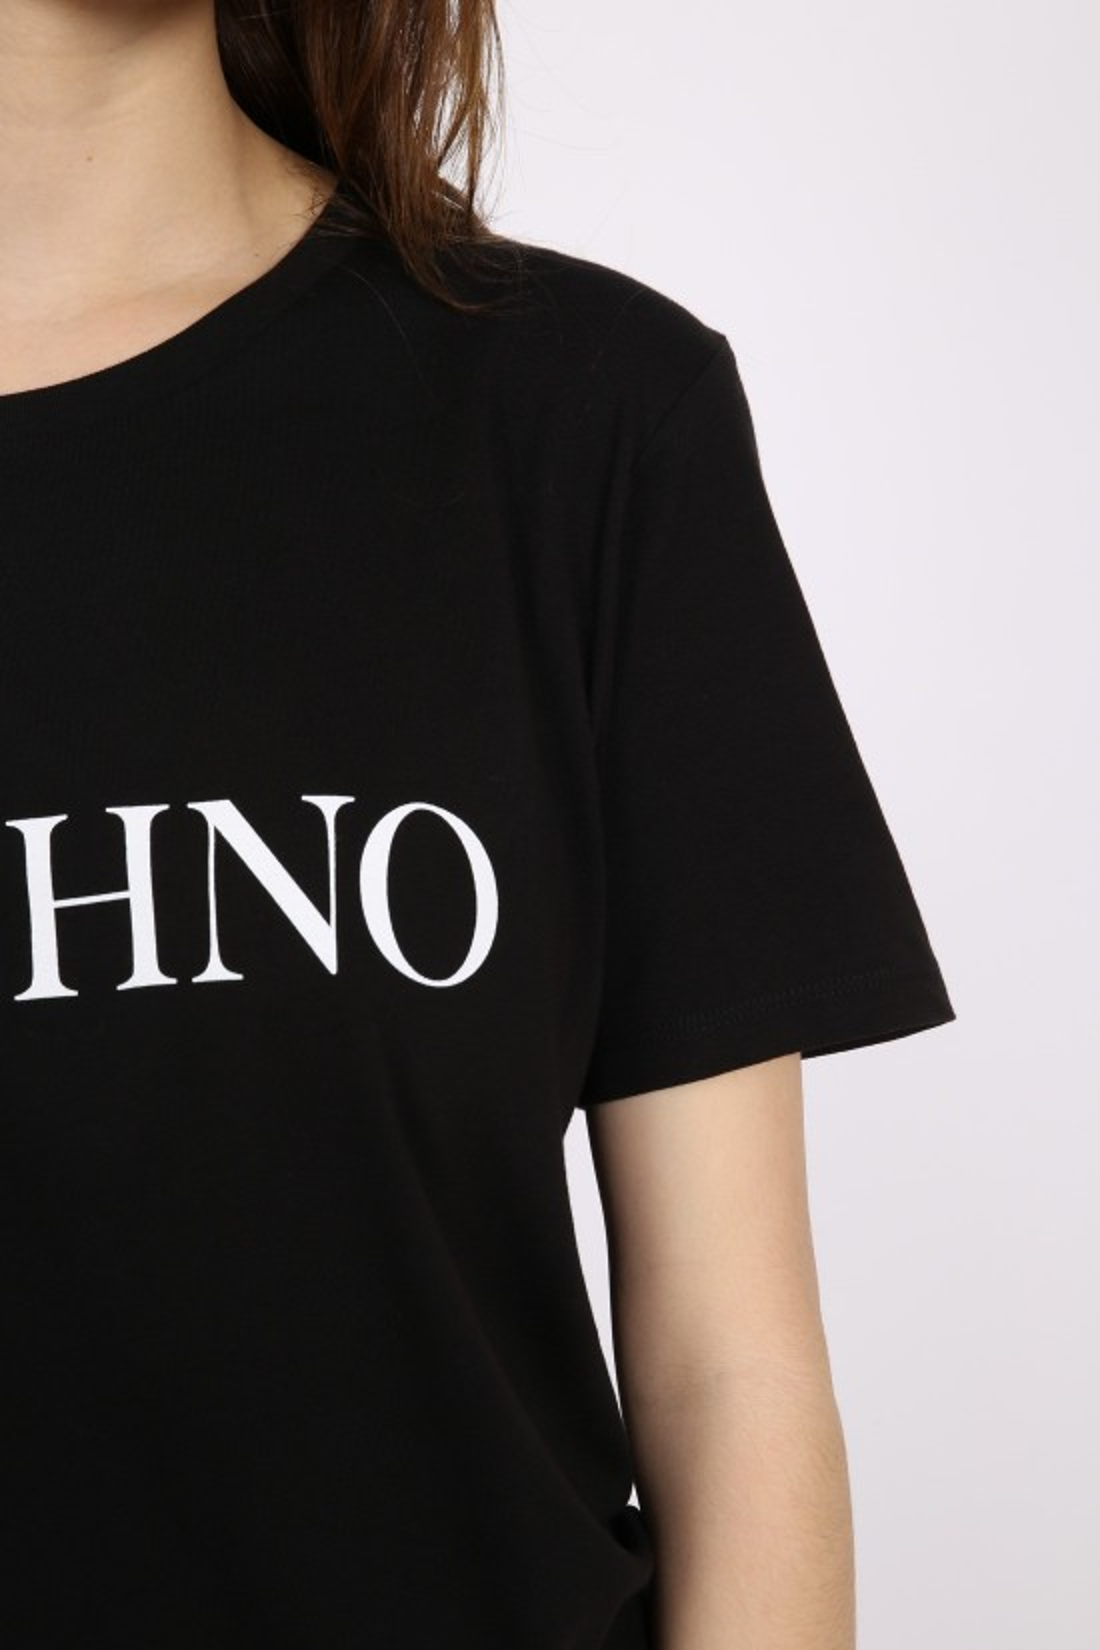 IDEA / Techno t-shirt Black